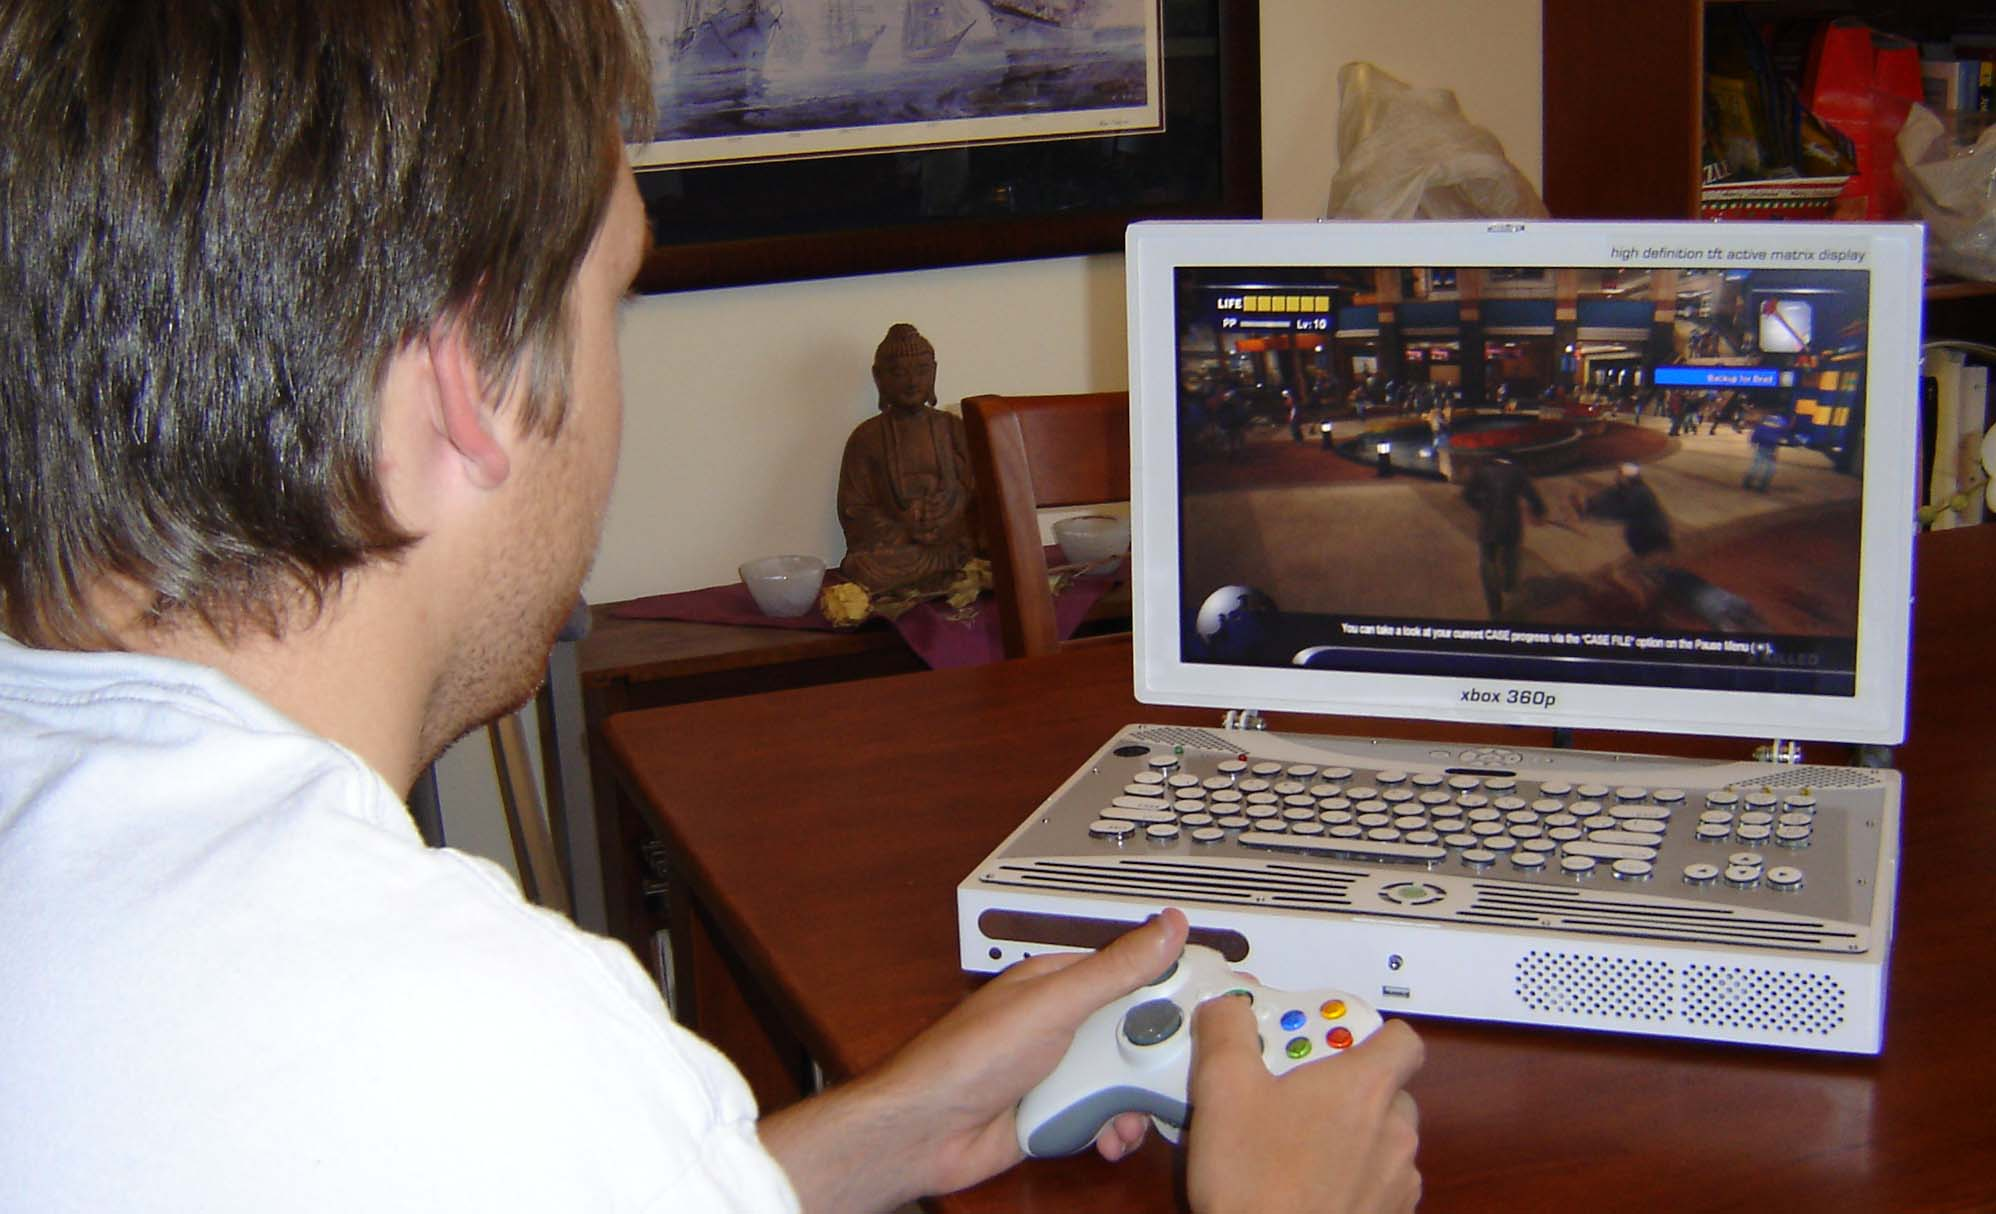 Xbox 360 Laptop Original Web Portal For Benjamin J Heckendorn